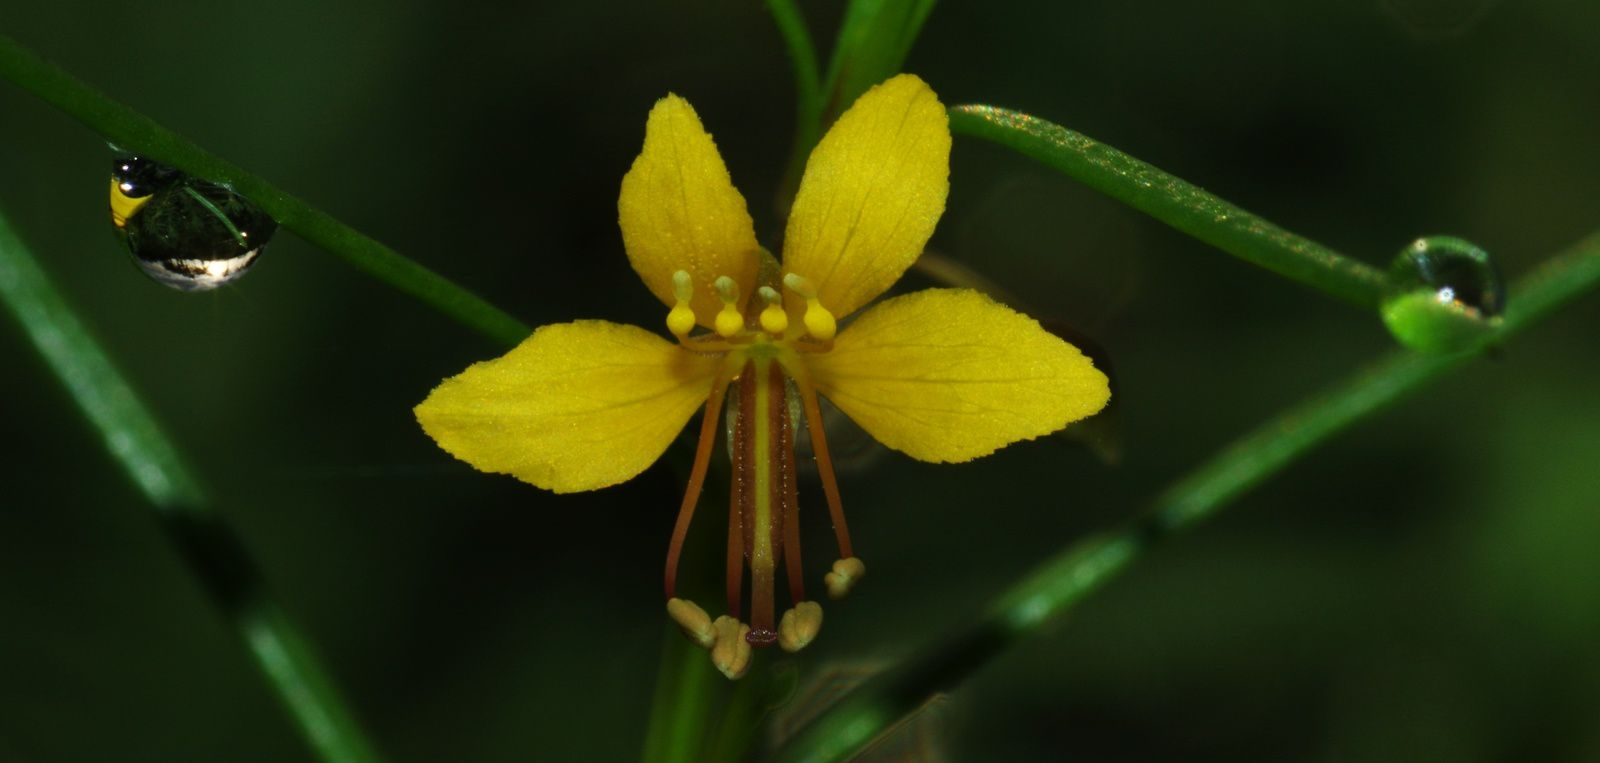 Cleome guianensis / Physostemon guianense